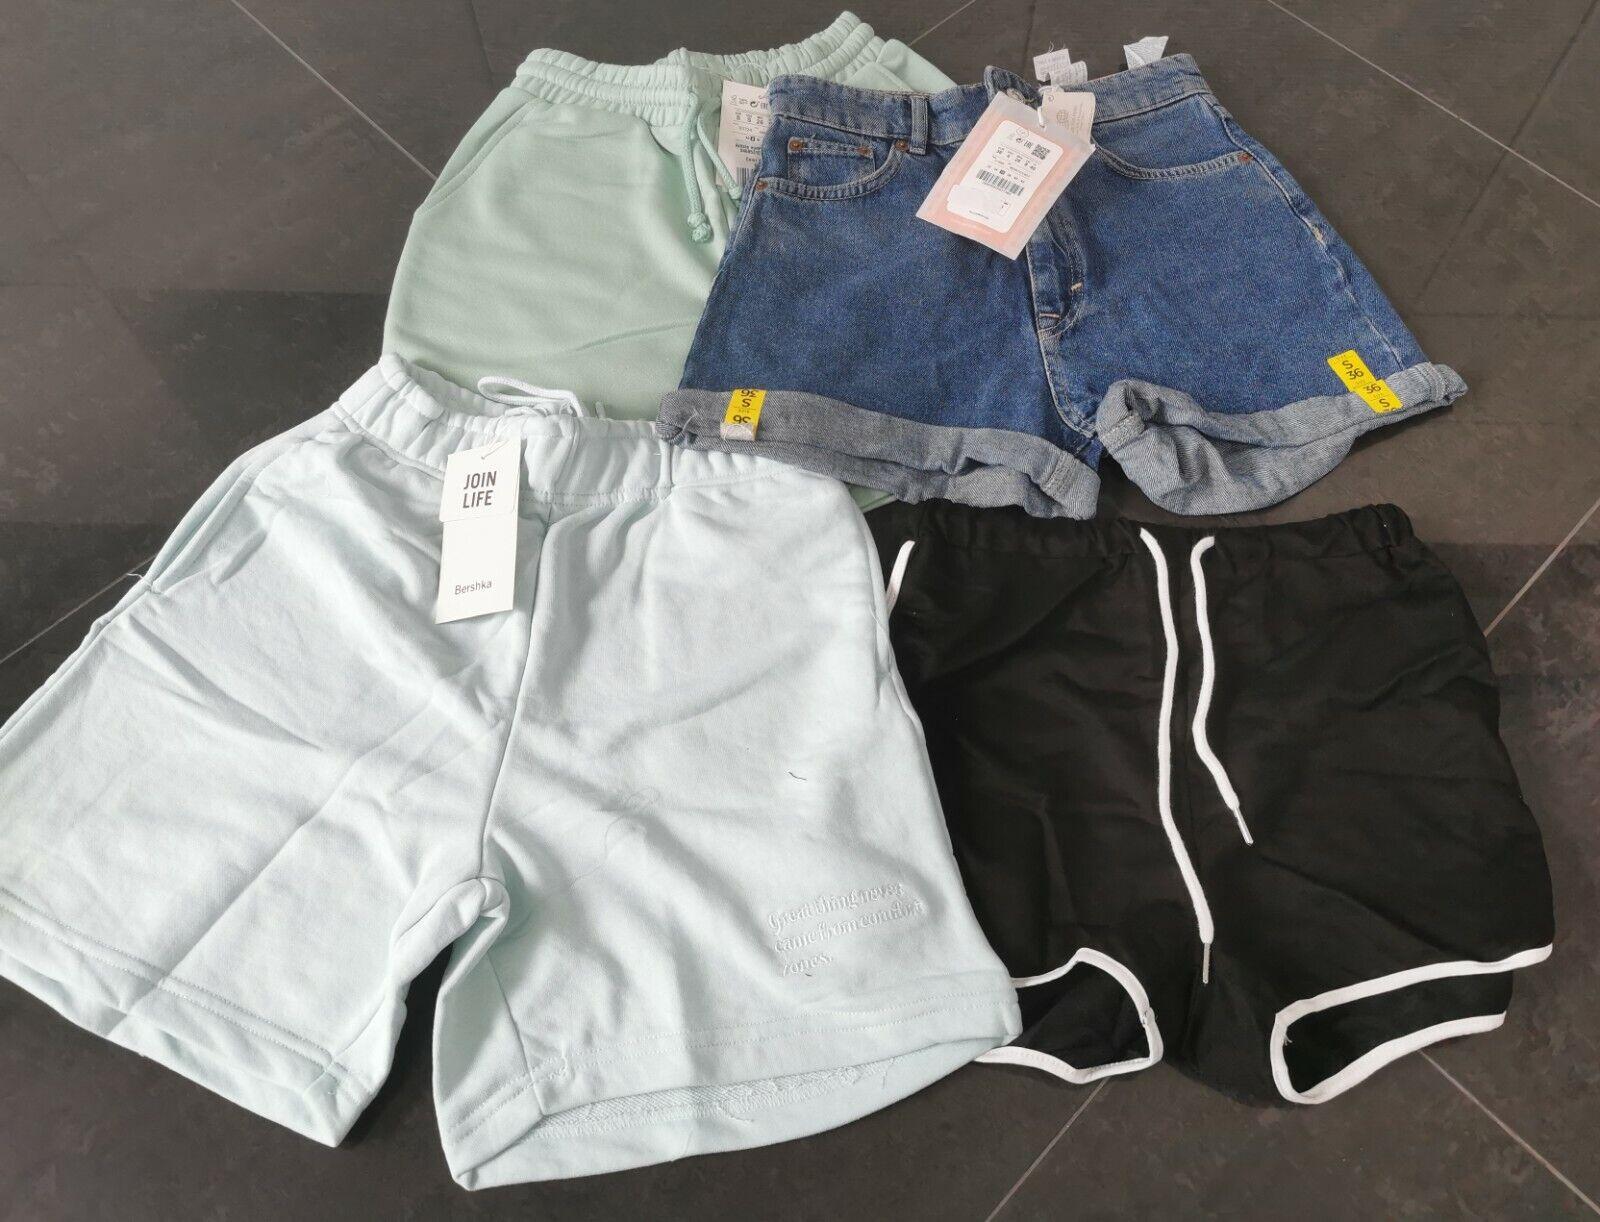 4-teilig Pull&Bear Bershka Shein Damen Short Kurze Hose Jeans blau schwarz Gr.36